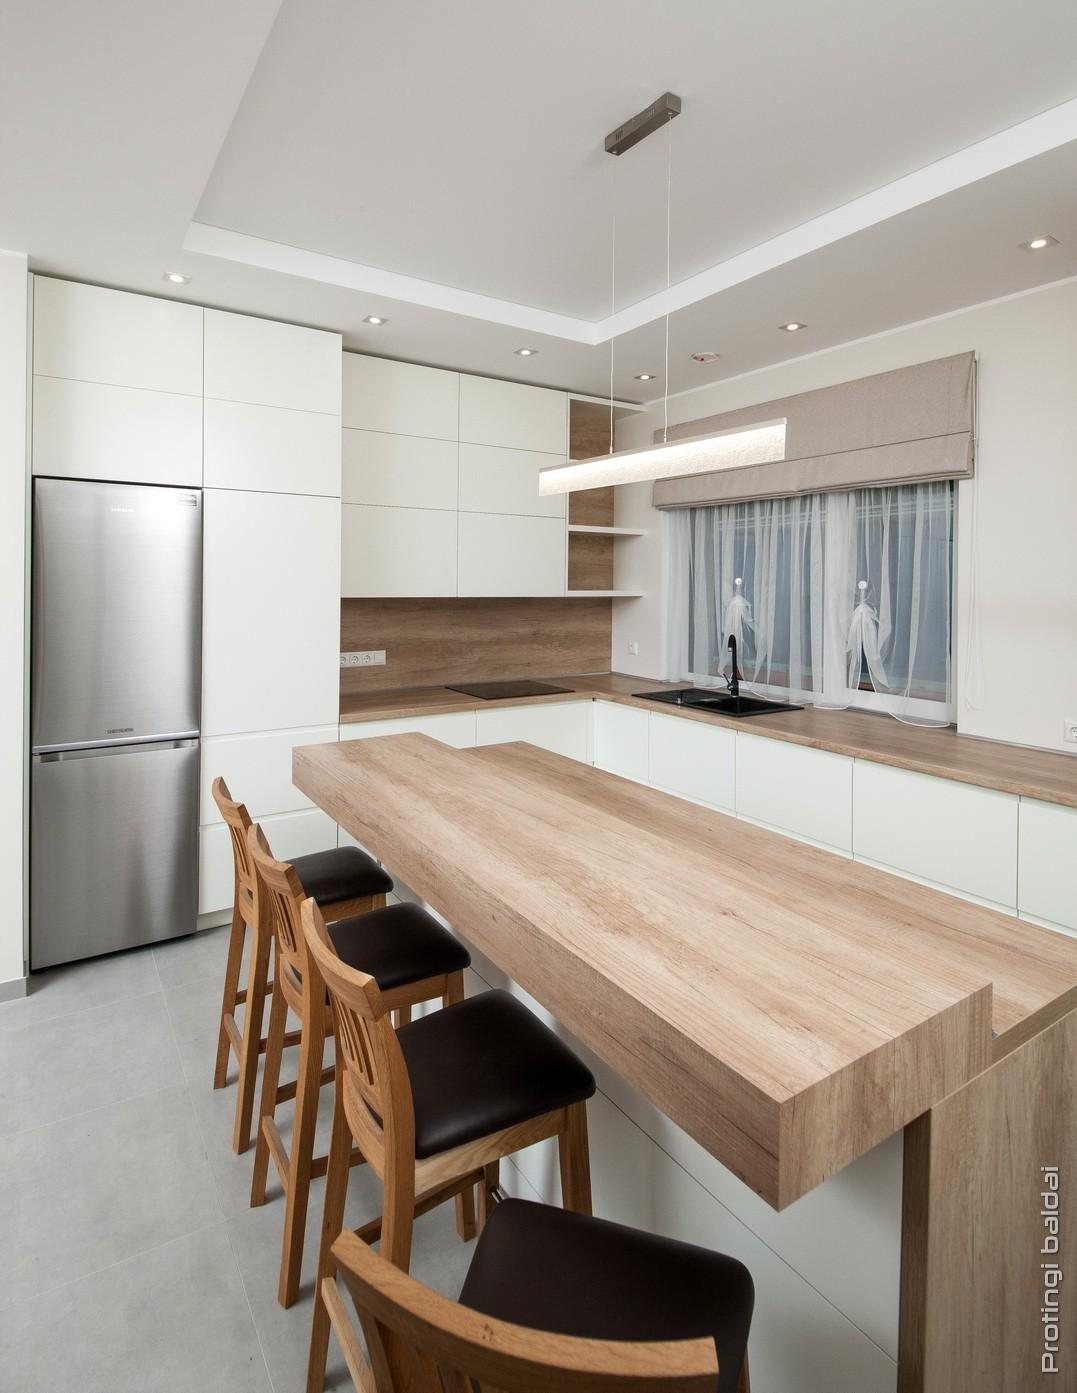 virtuves_baldai_pb22_06